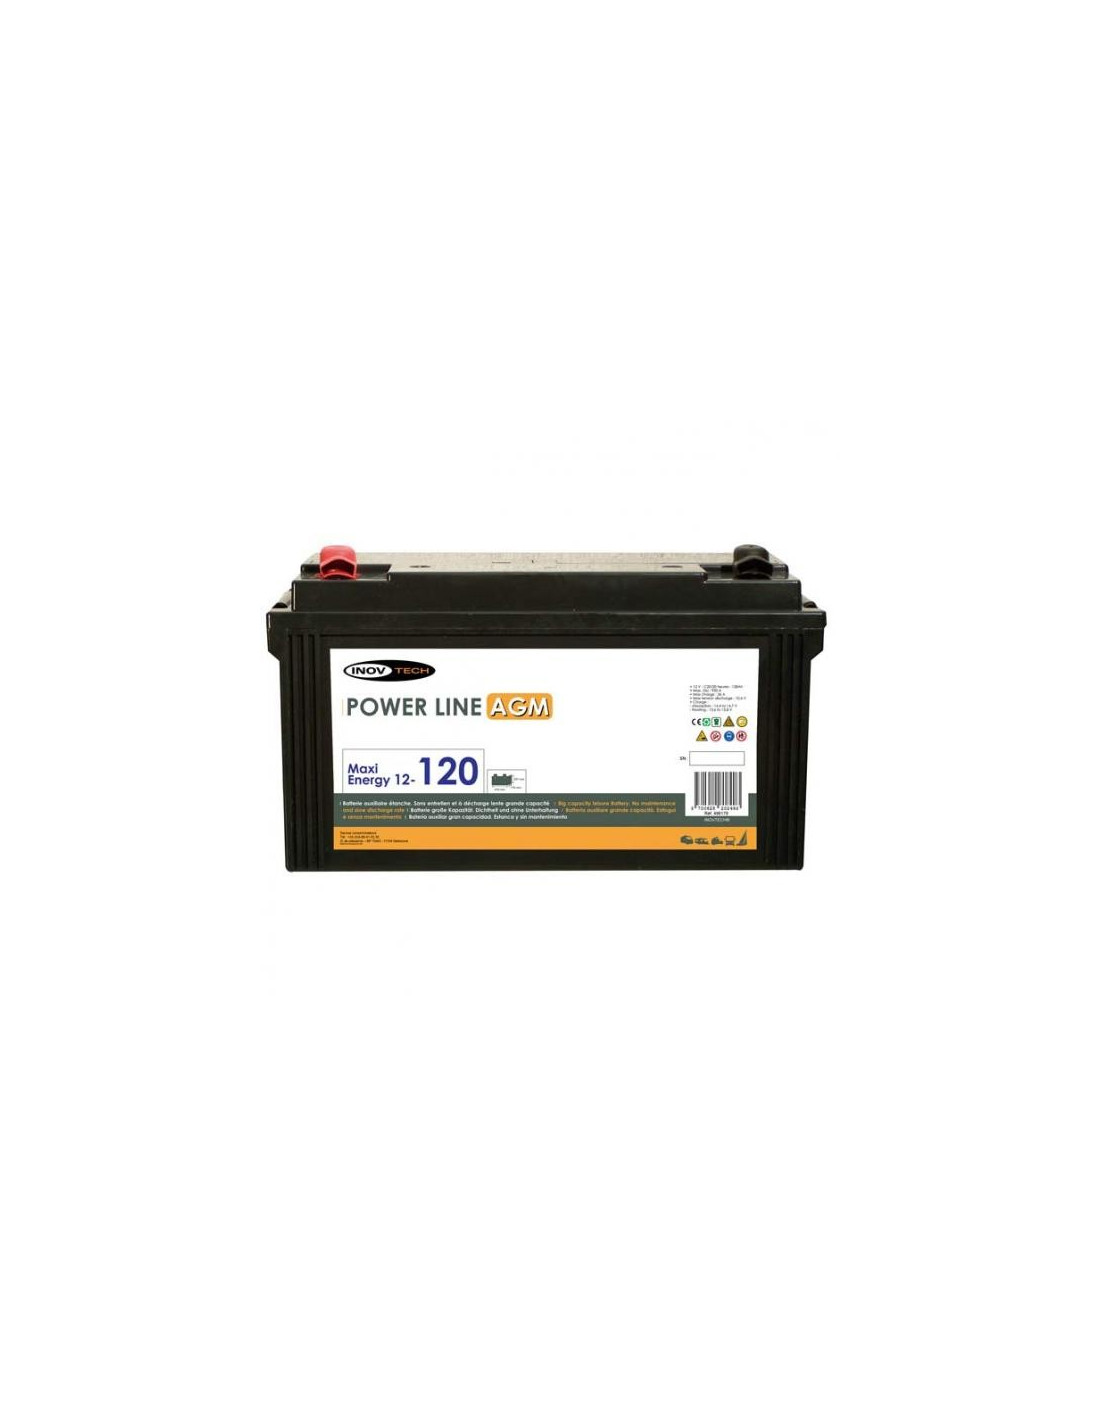 bateria auxiliar power line agm 120a elektron tienda de camping online. Black Bedroom Furniture Sets. Home Design Ideas